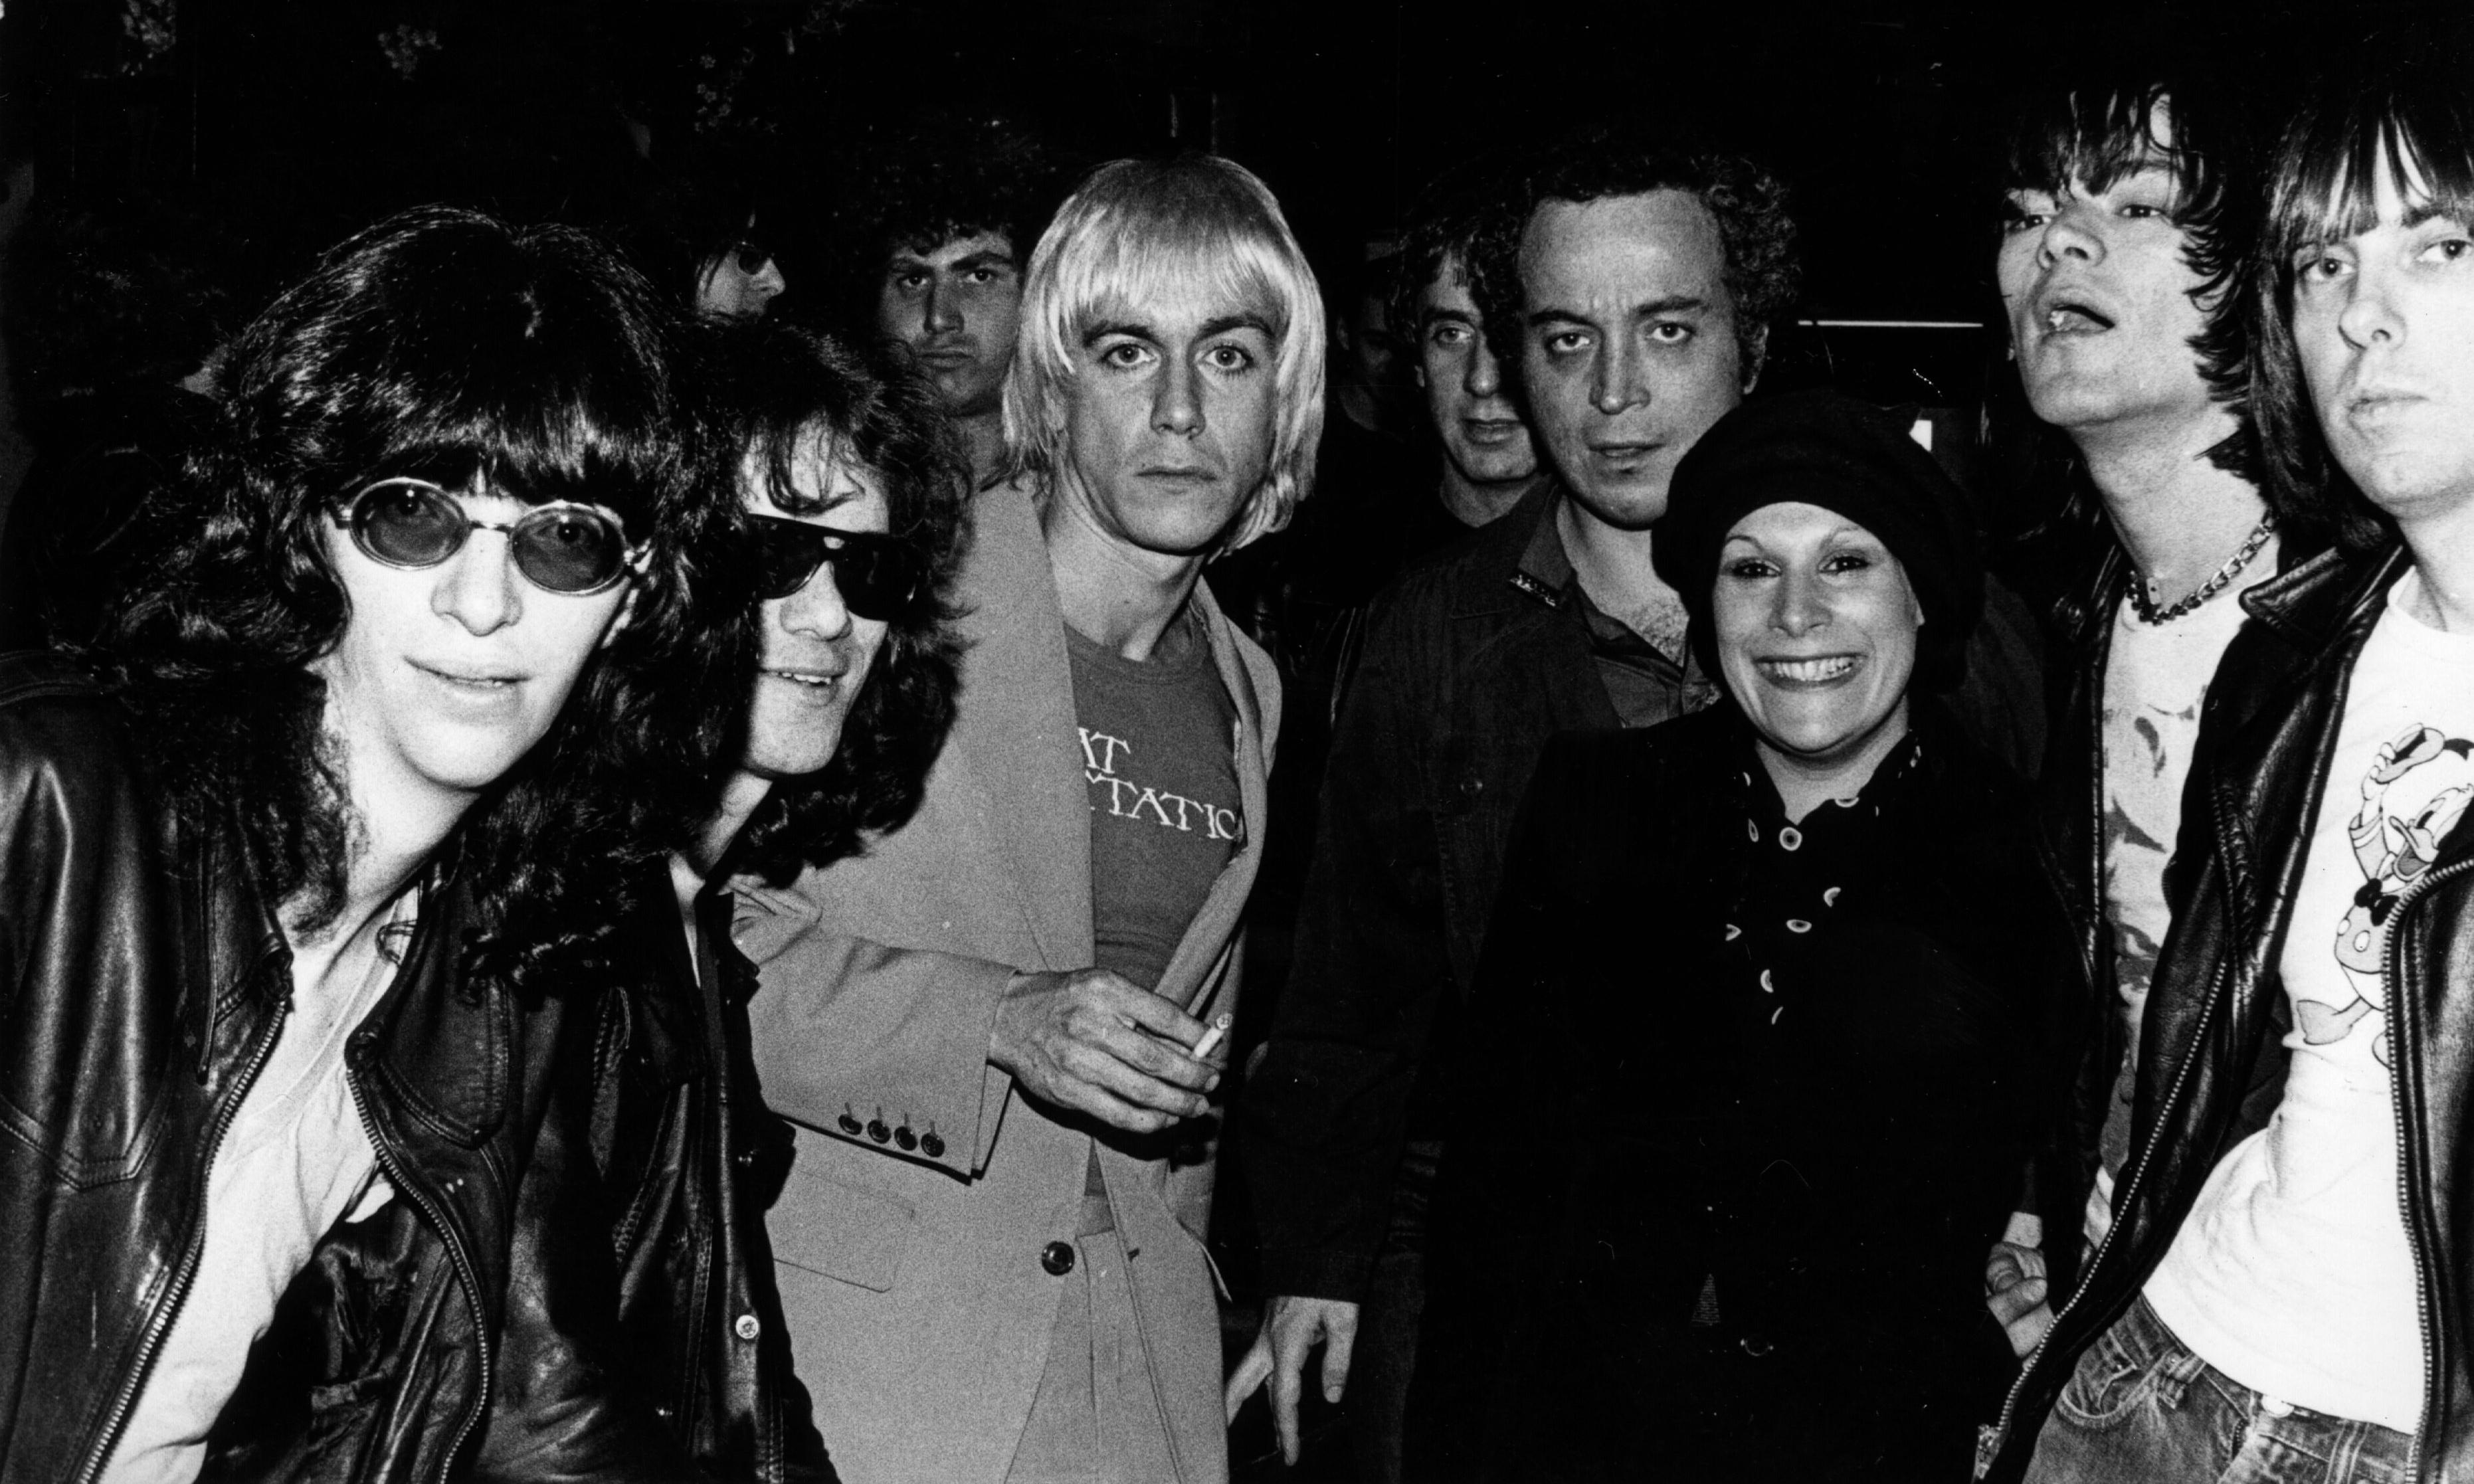 TV tonight: the birth of punk rock, according to Iggy Pop